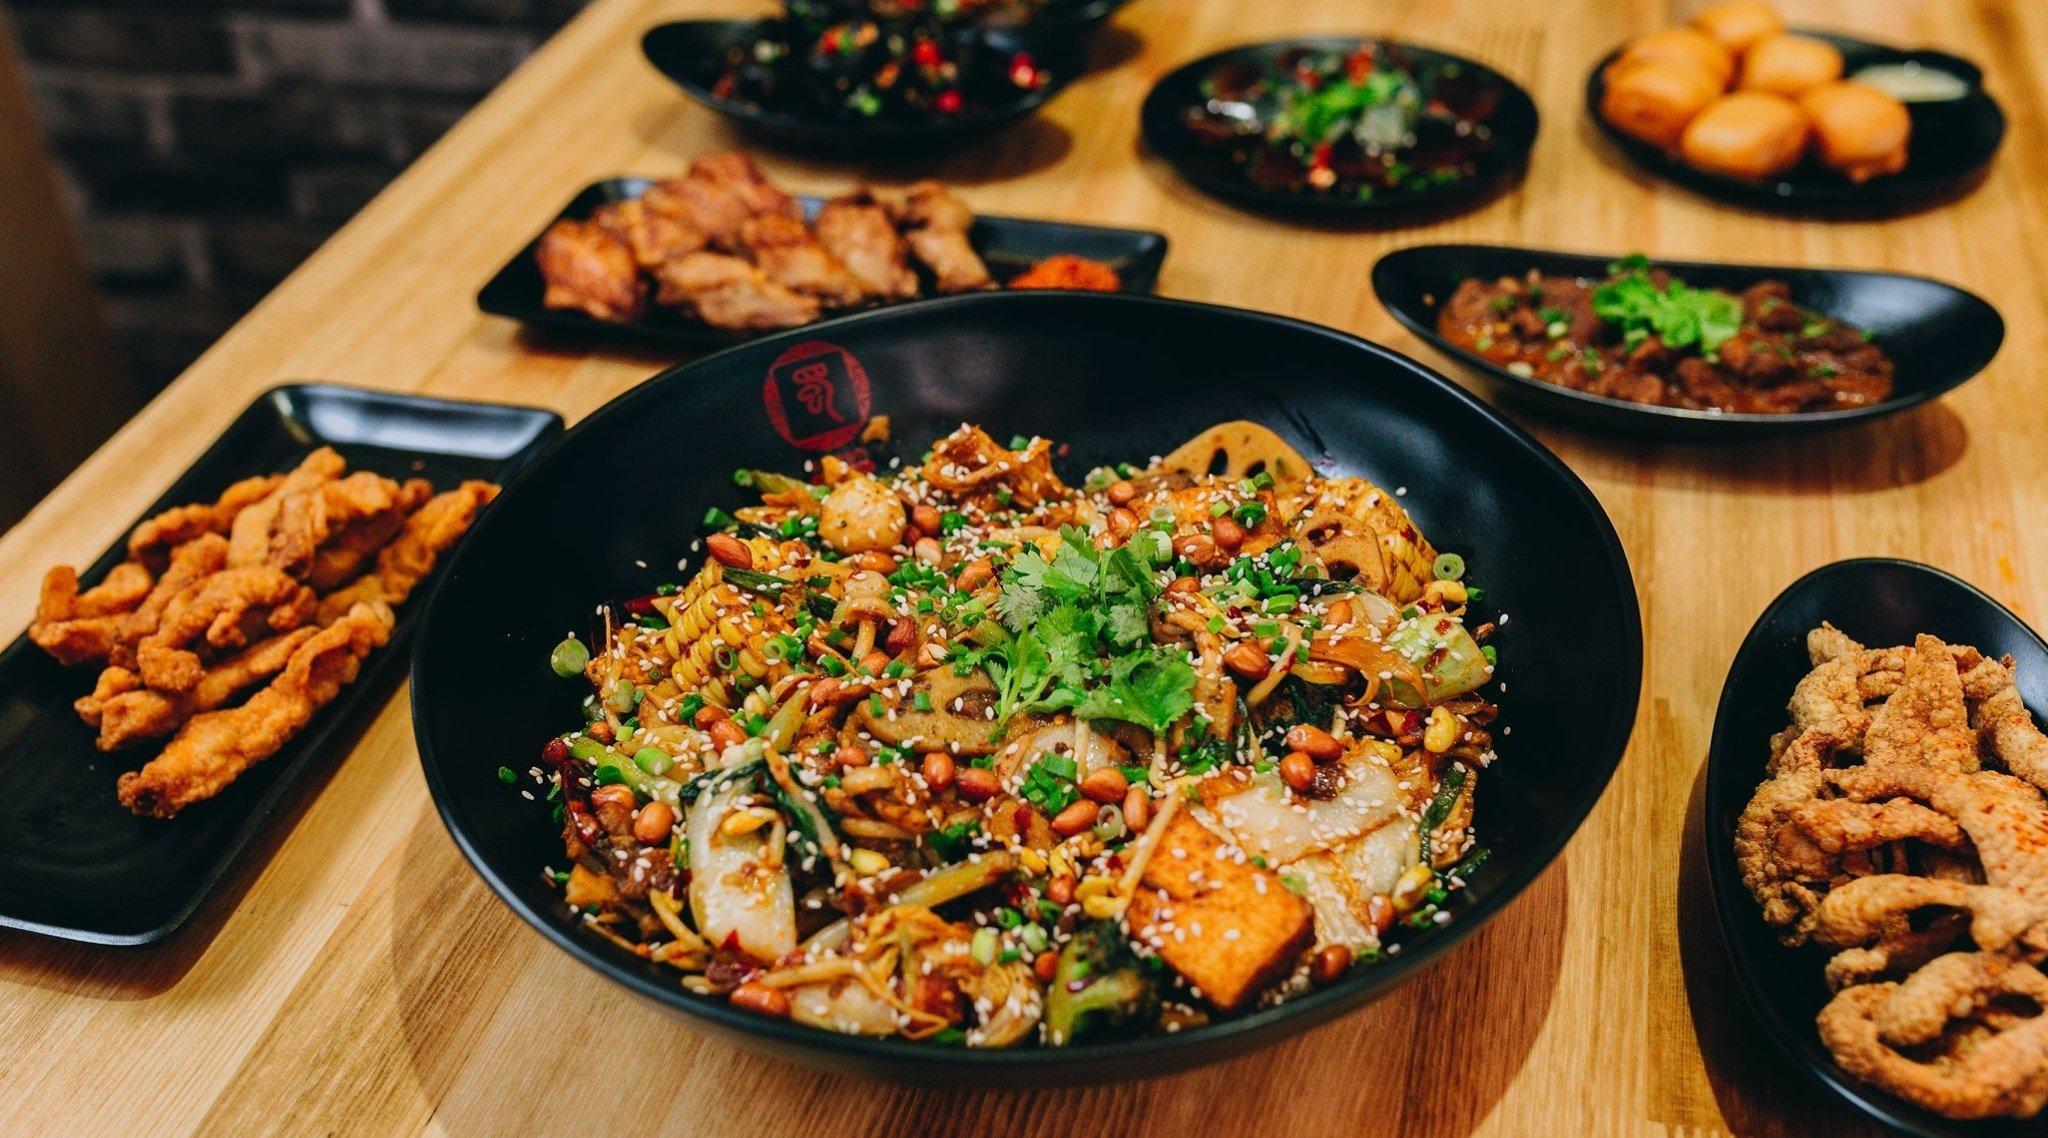 SHU Spicy Pot 蜀麻辣香锅 - Publika-37% OFF 雙人套餐